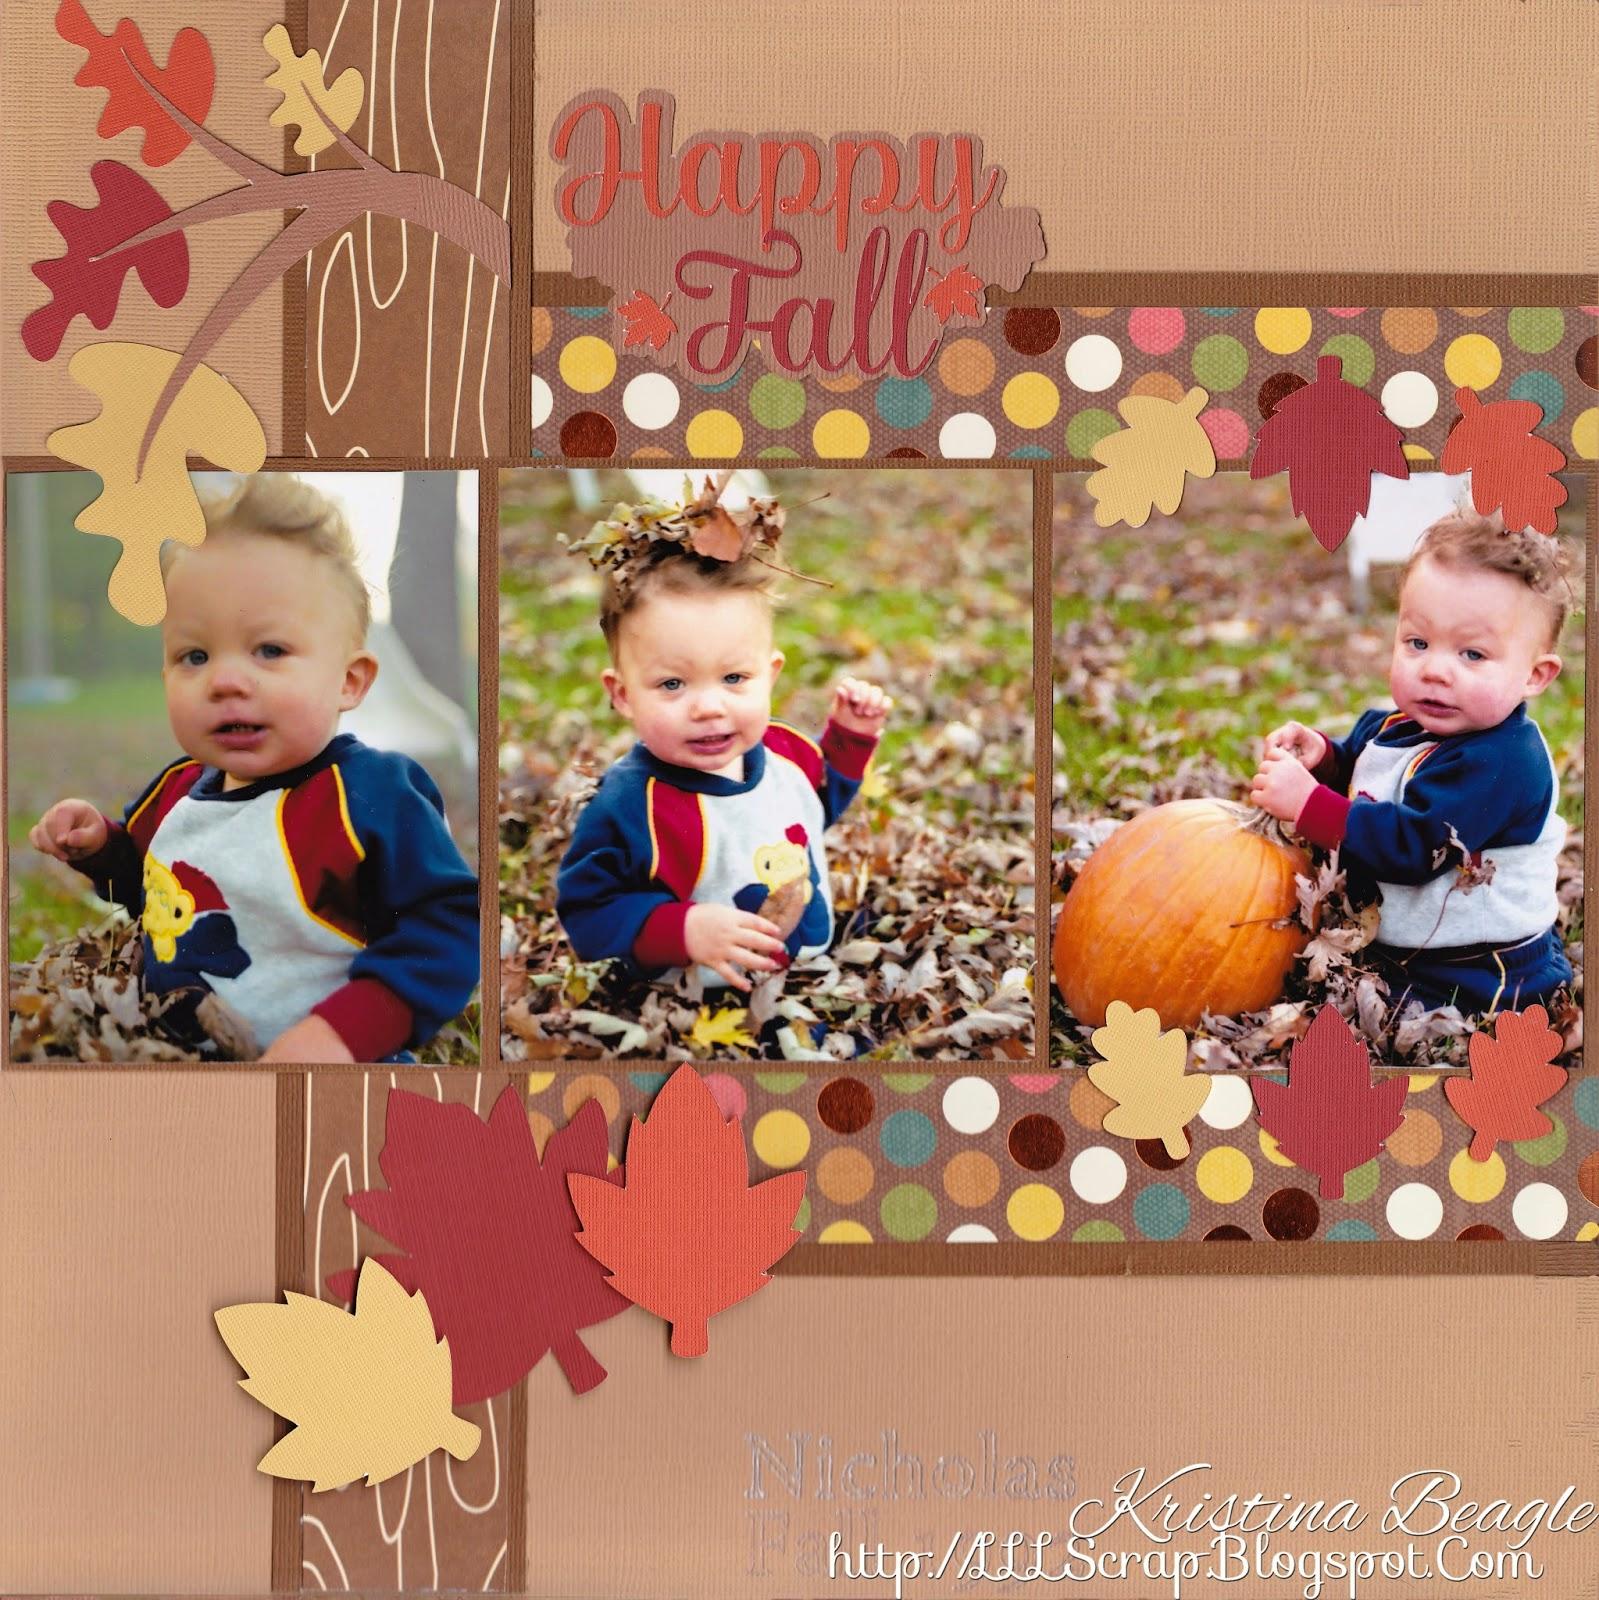 http://kellycraftblog.blogspot.com/2014/11/happy-fall-layout-by-kristina-beagle.html